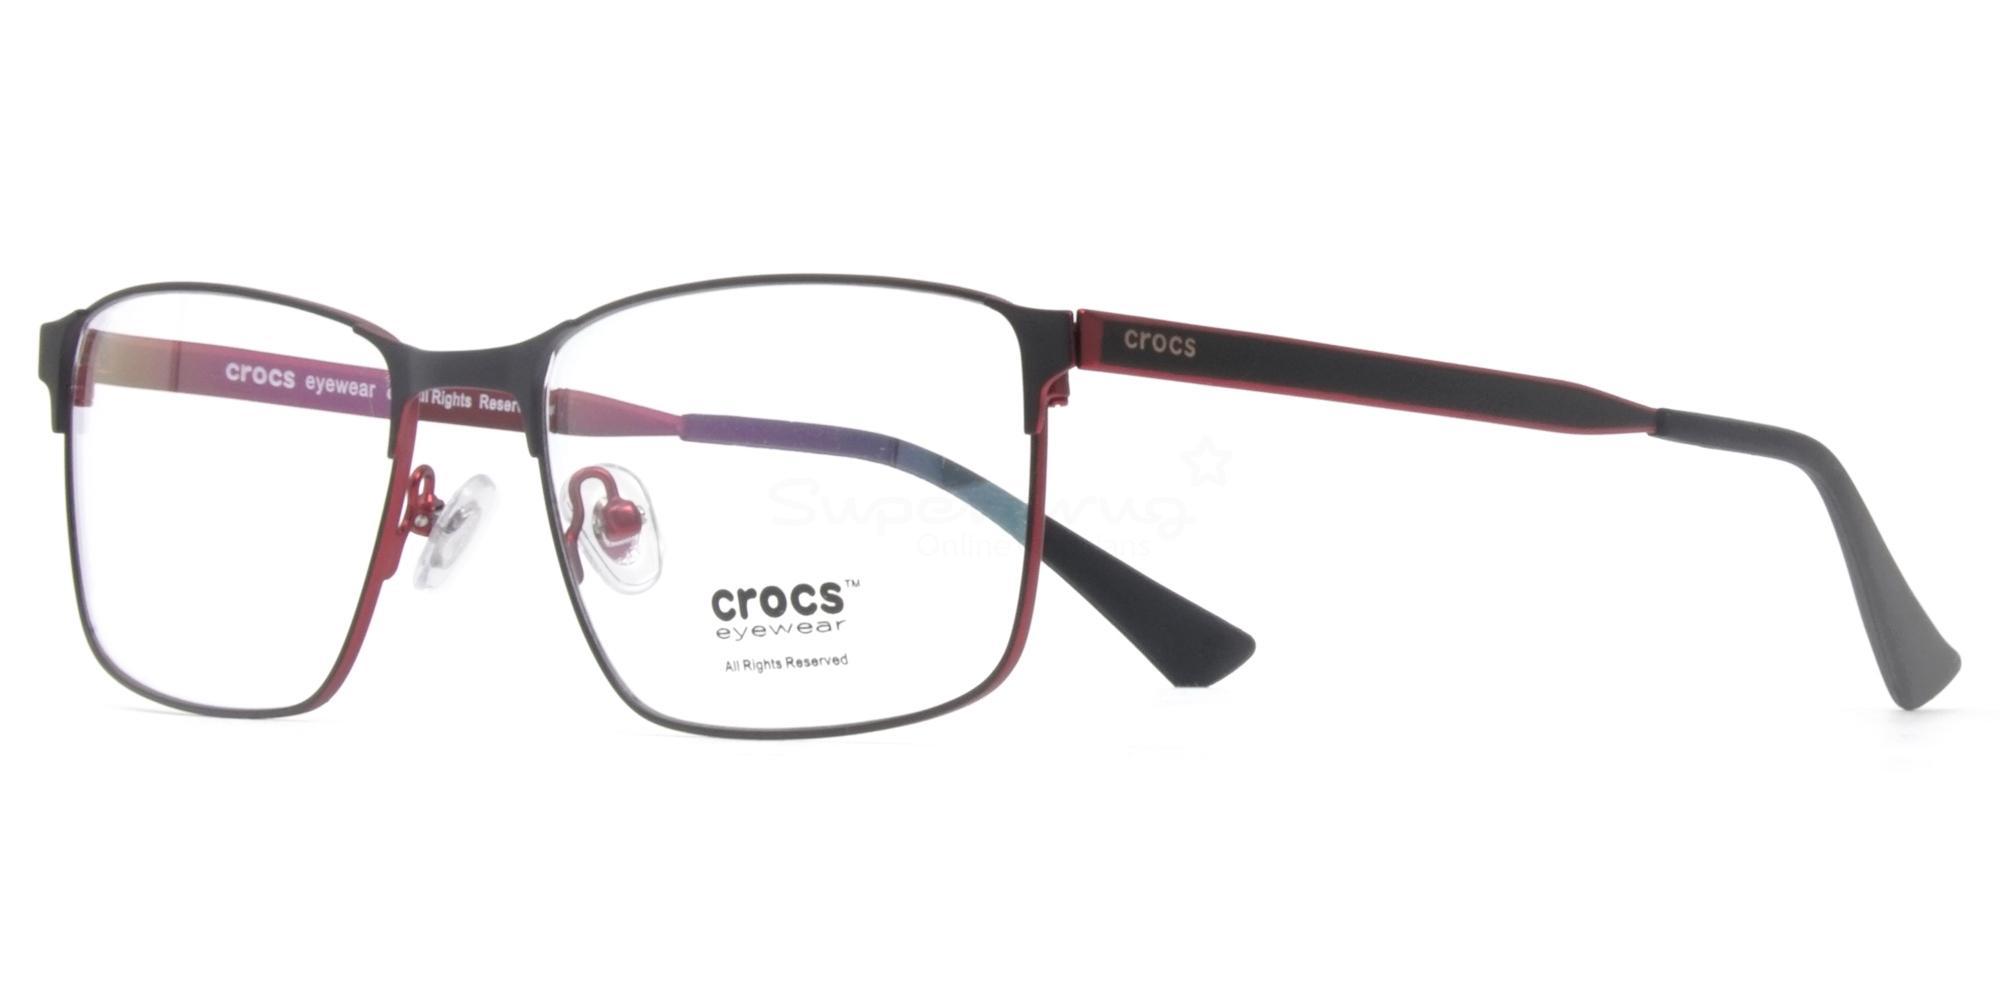 20RD CF4357 Glasses, Crocs Eyewear